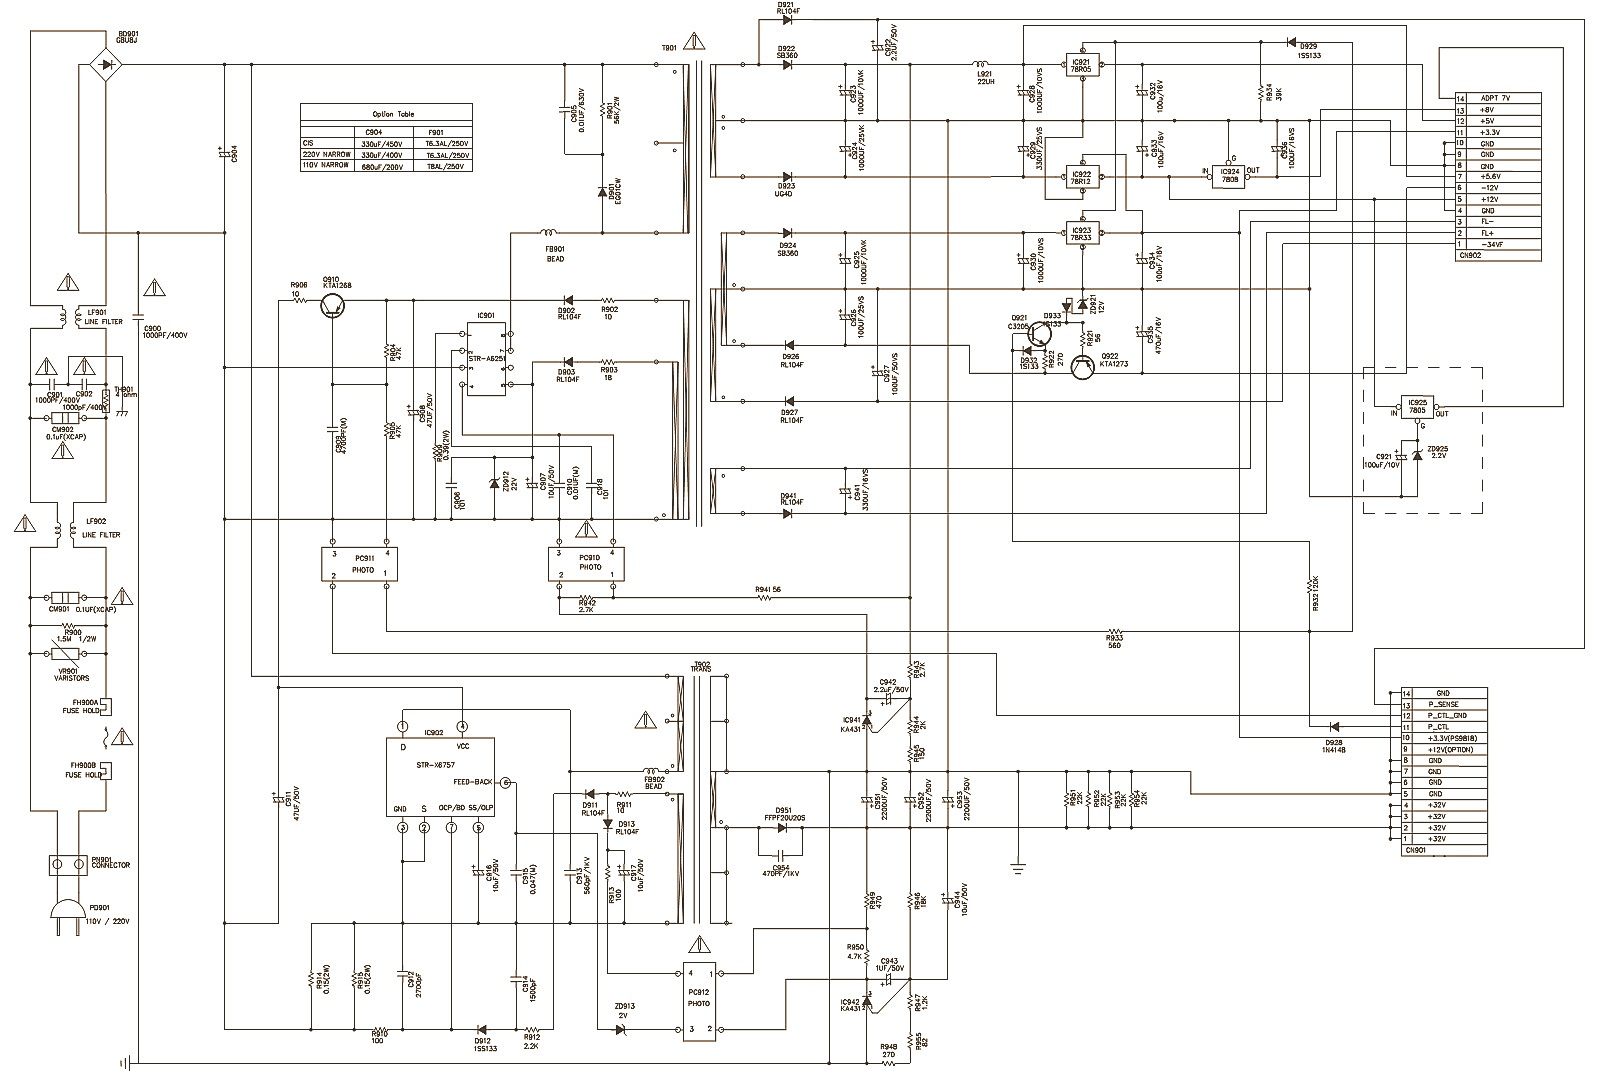 lg lh t550 xh tk750 dvd cd karaoke receiver circuit. Black Bedroom Furniture Sets. Home Design Ideas